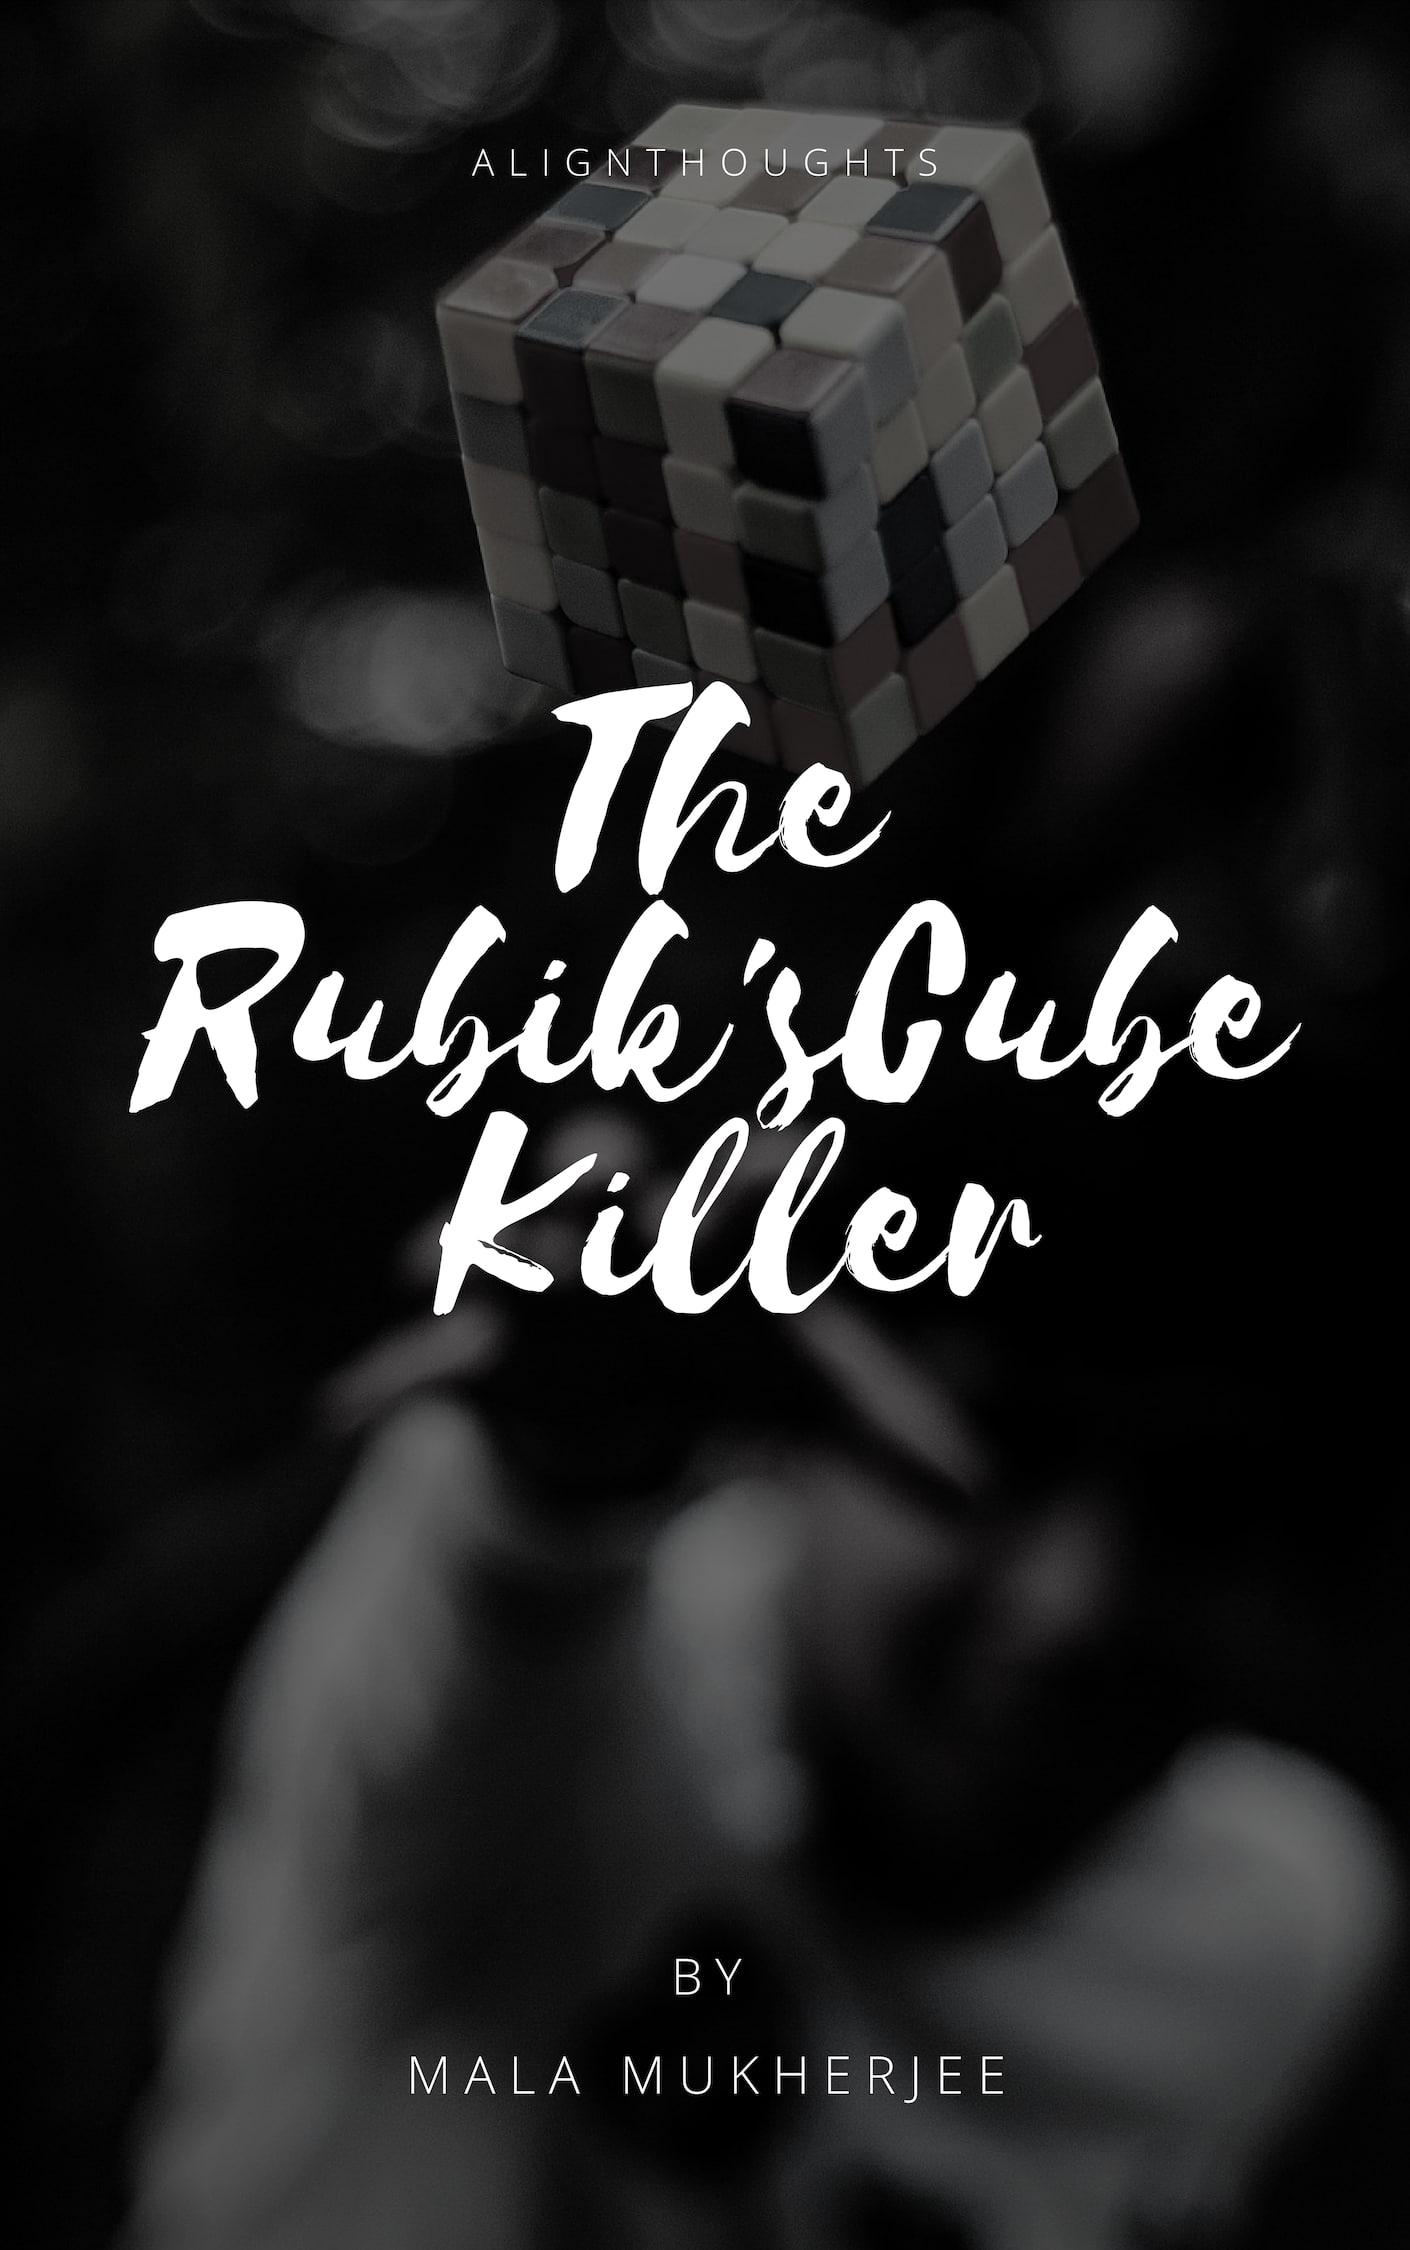 The Rubik'sCube killer - alignthoughts